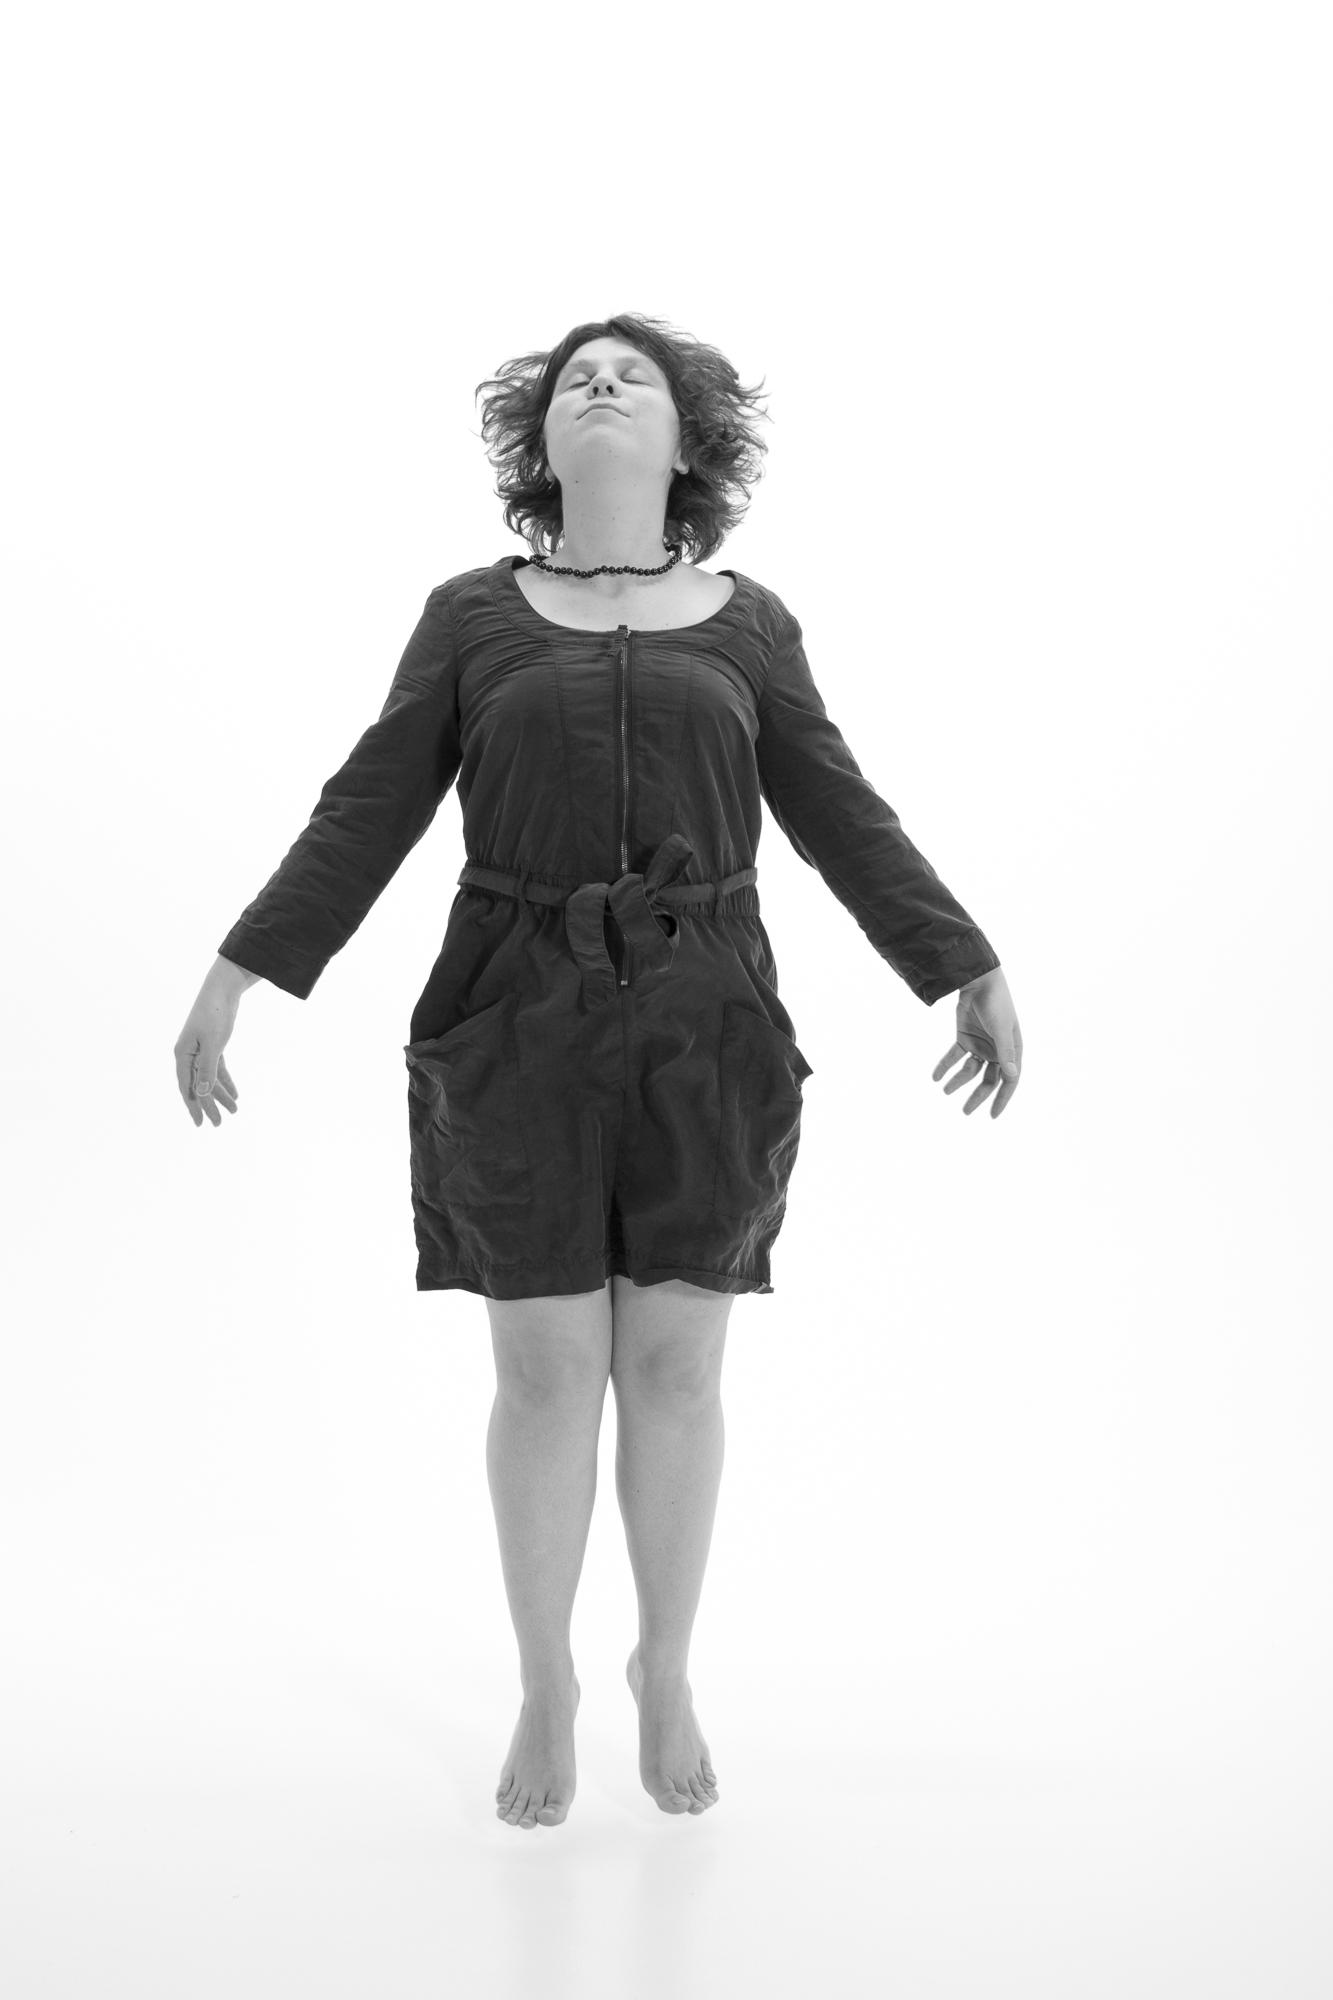 selfportrait, flying.